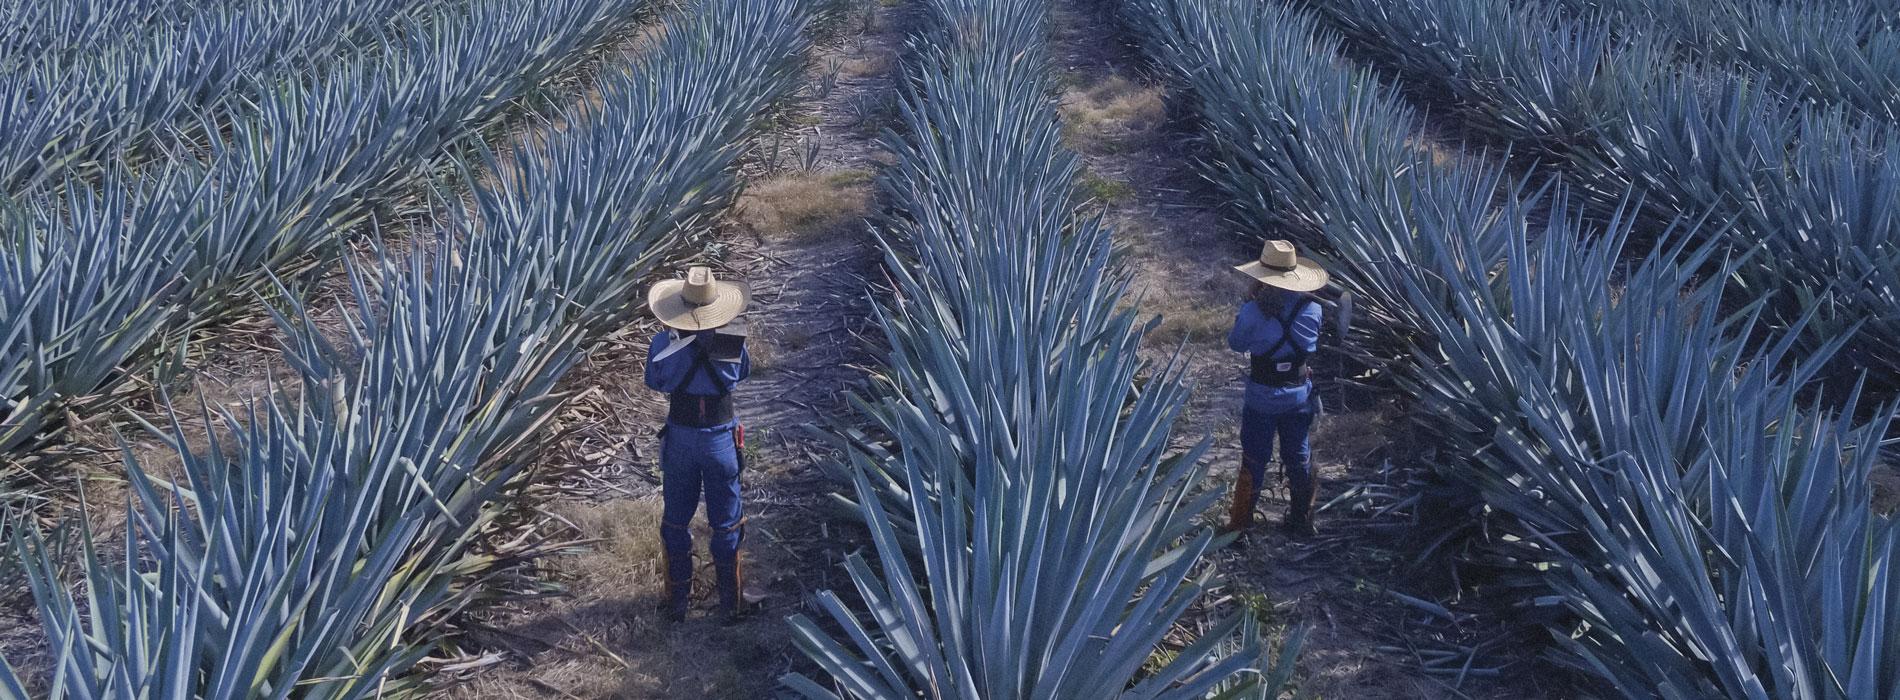 tequila-don-julio